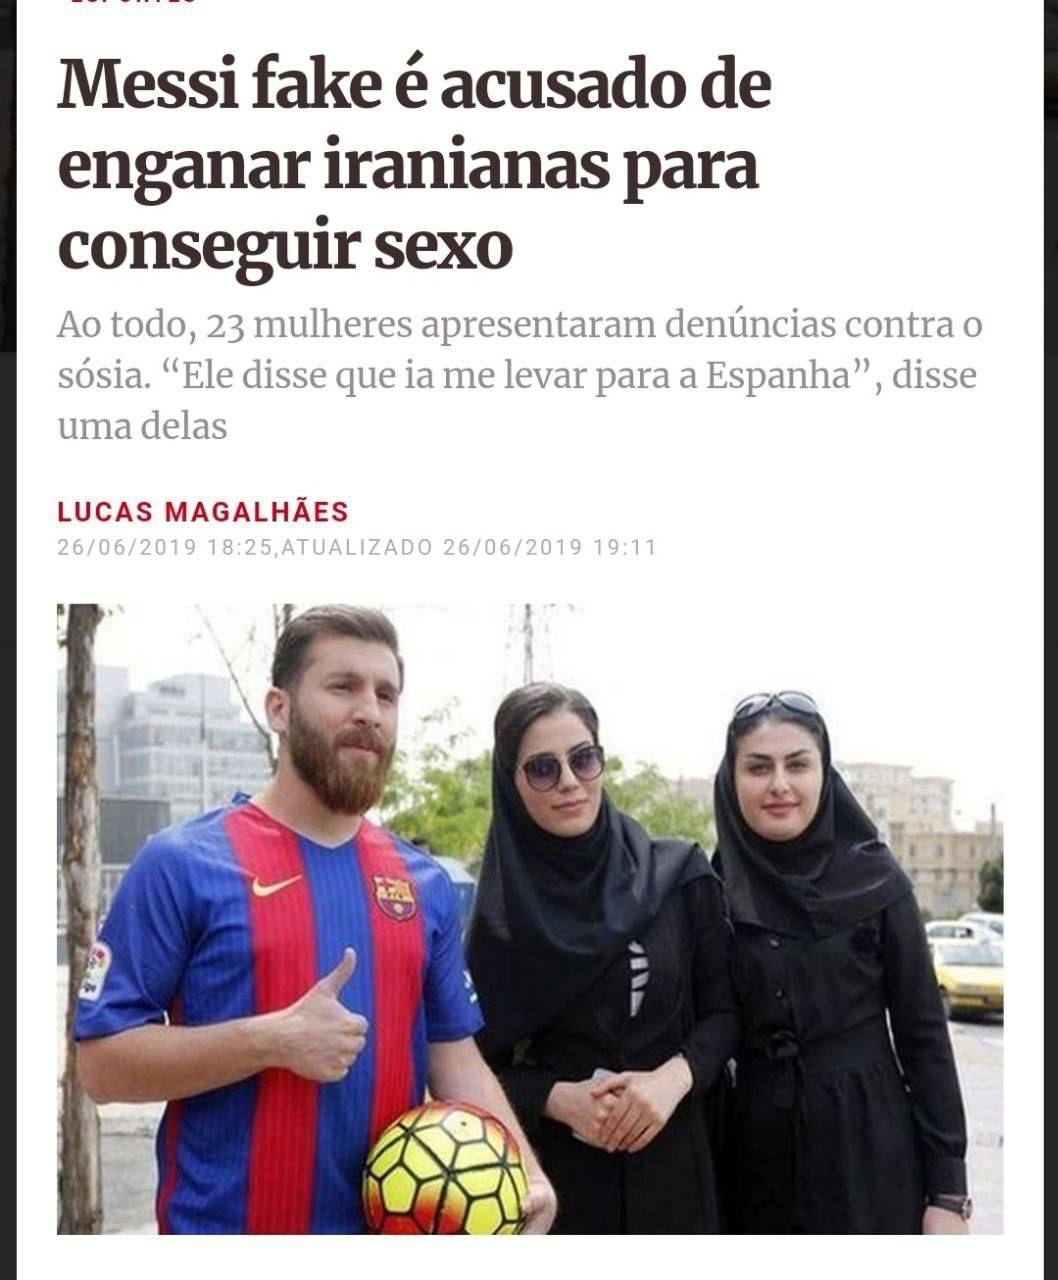 Messi procura sequiçu - meme